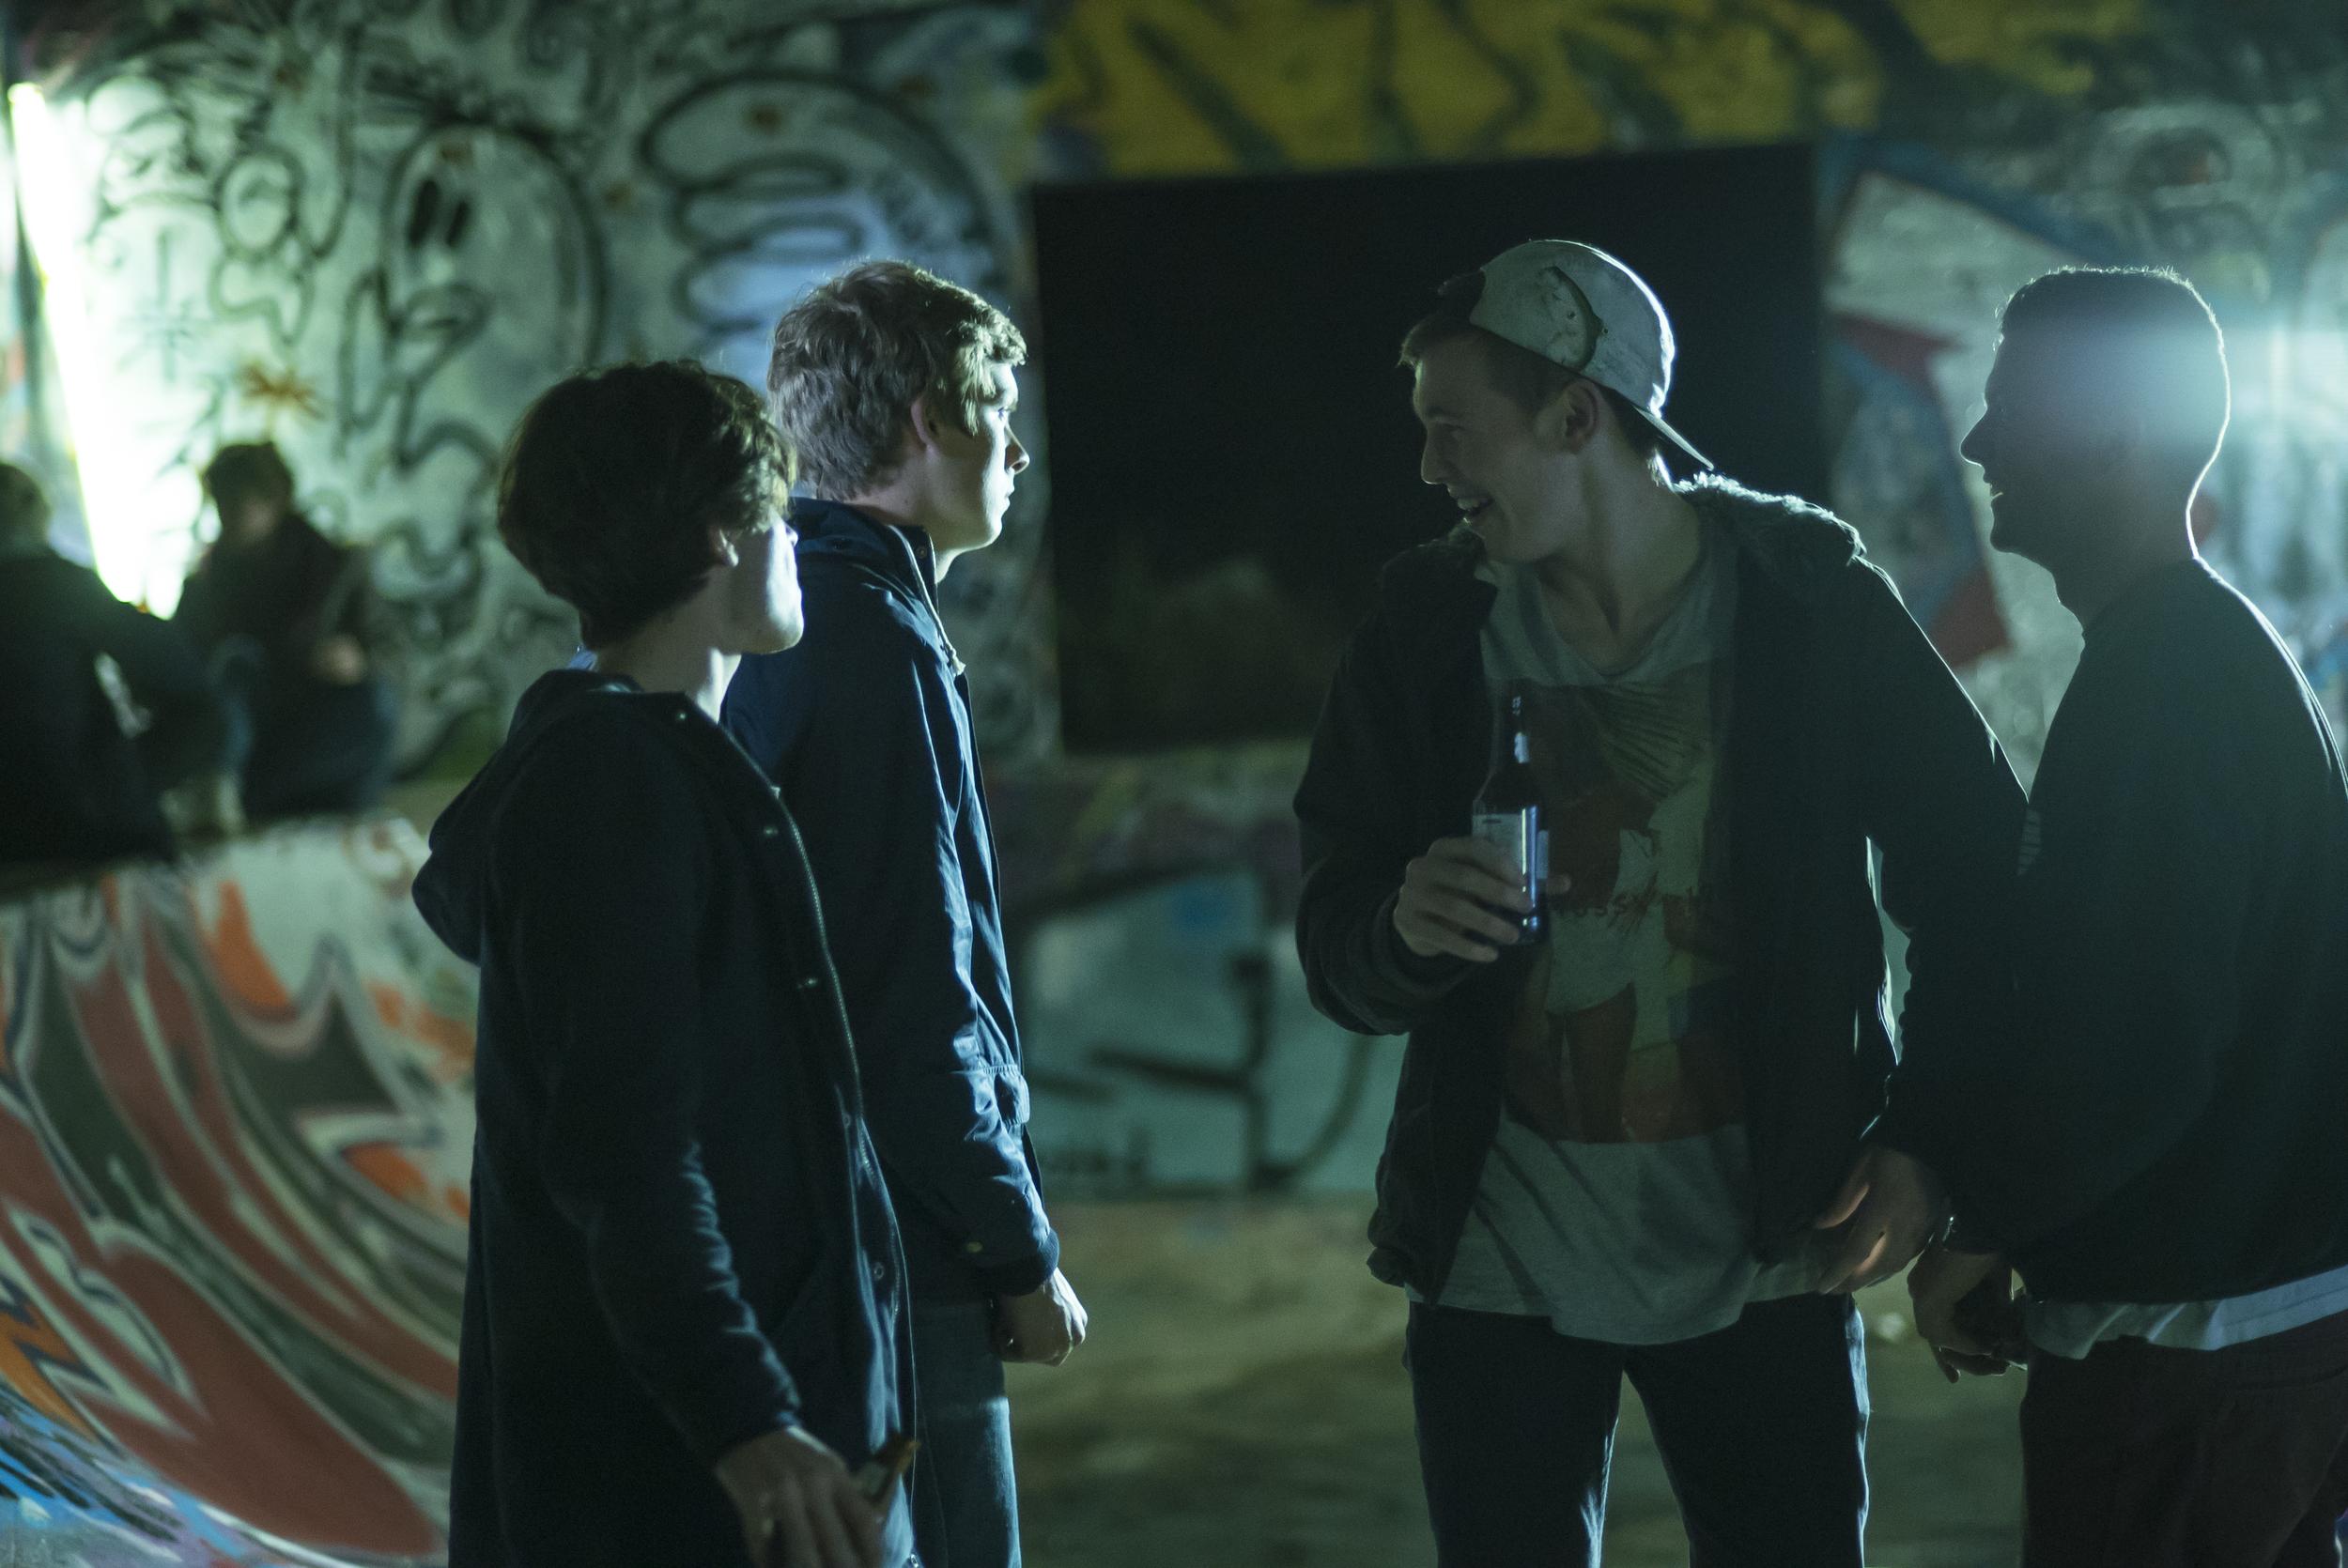 Headlight - Scene in the skate bowl.